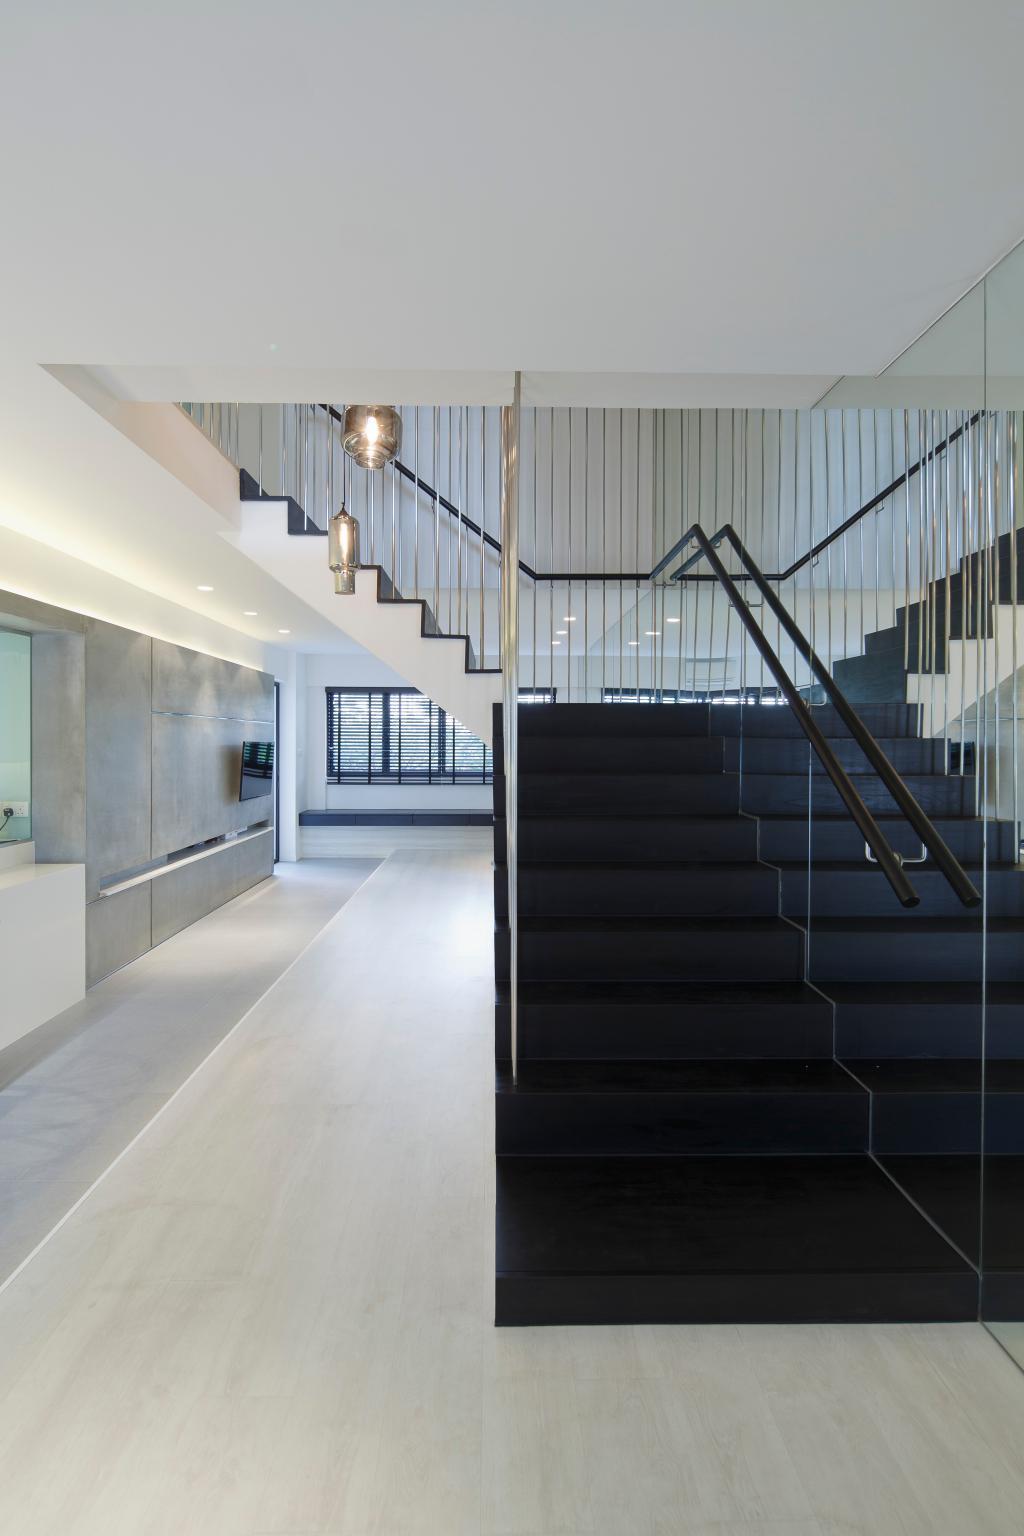 Modern, HDB, Cashew Road, Architect, EHKA Studio, Banister, Handrail, Staircase, Corridor, Light Fixture